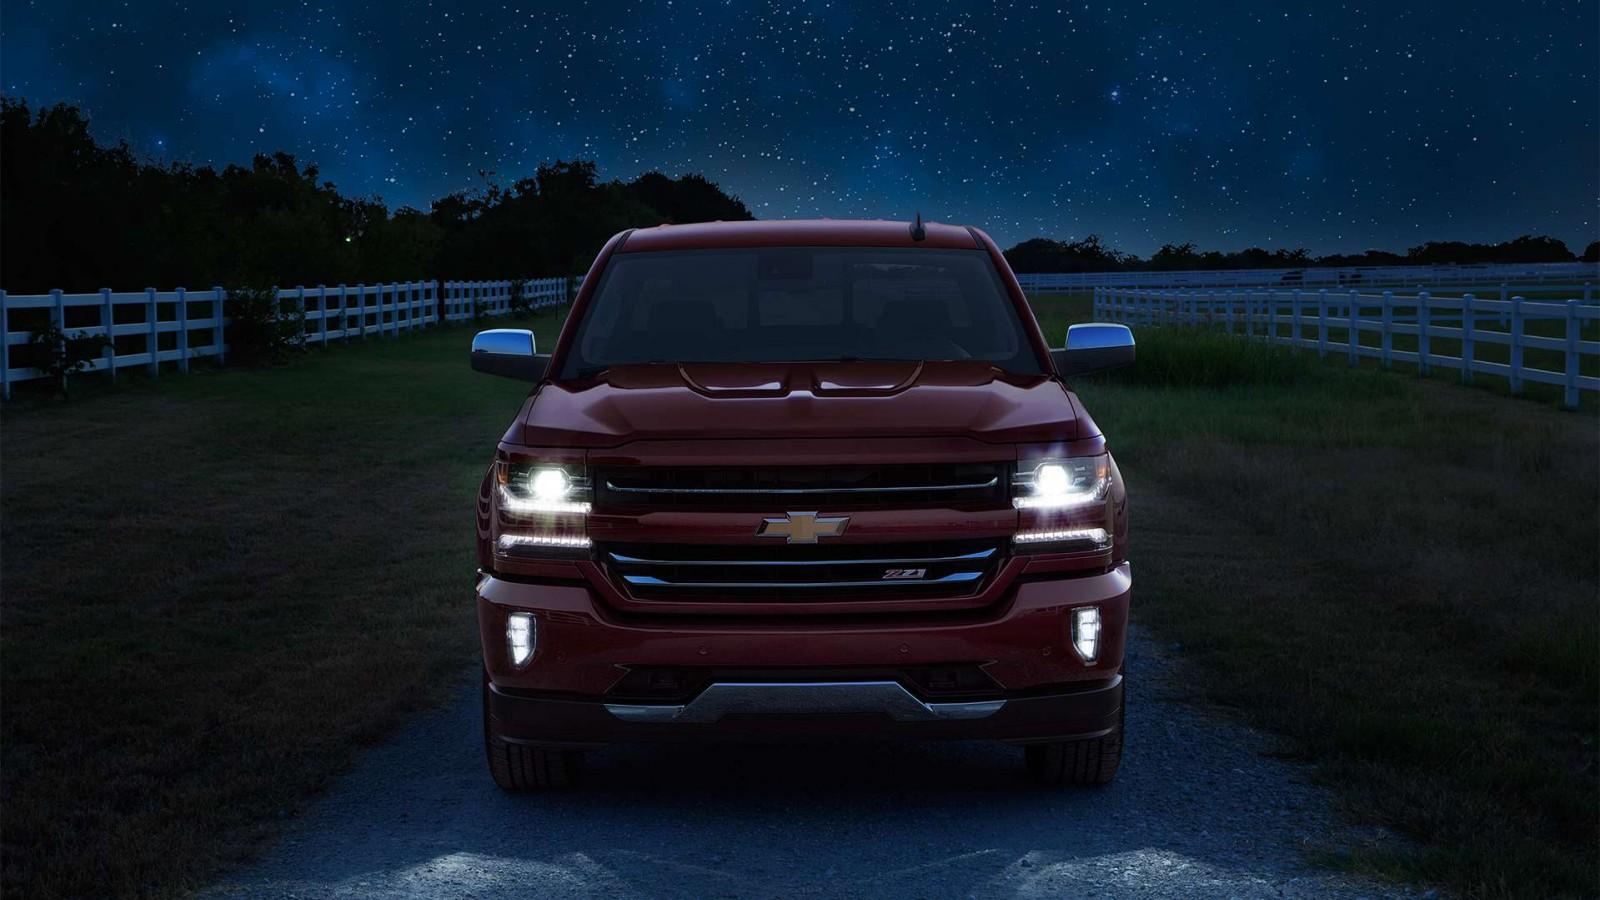 New Chevrolet Silverado 1500 Exterior image 2